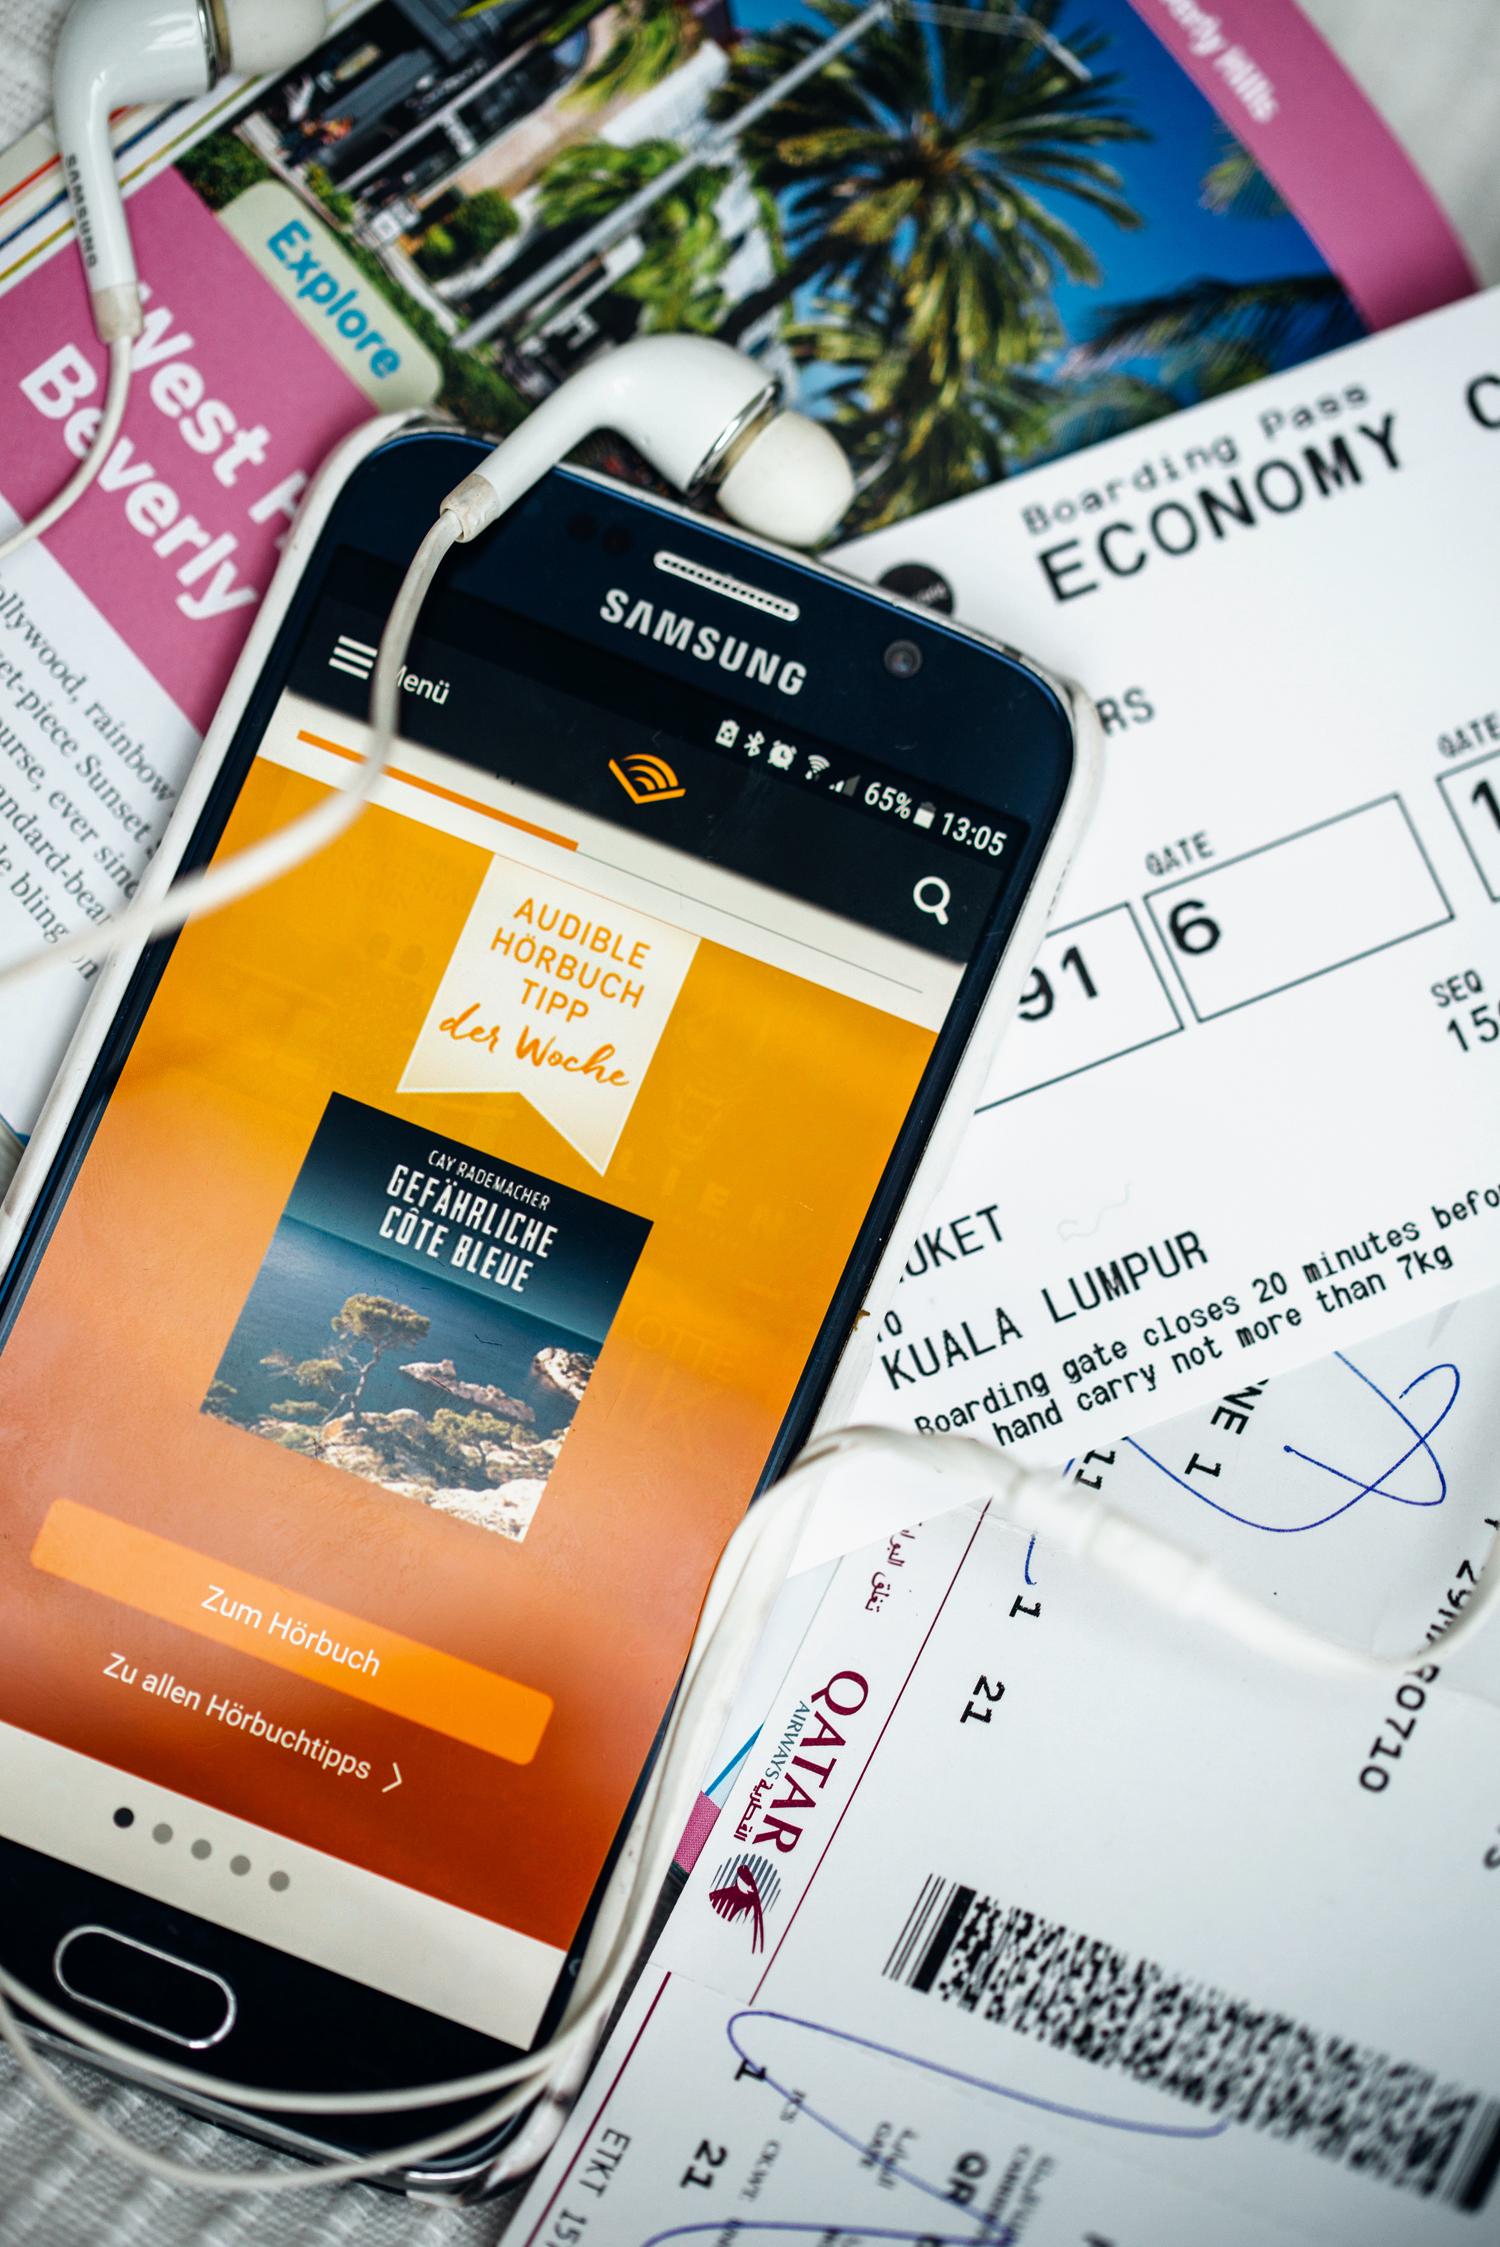 Langstreckenflug überstehen_Flug Hacks_Reiseblog_Flug tipps_Kiamisu_Reiseblogger_Travel Hacks-Final1